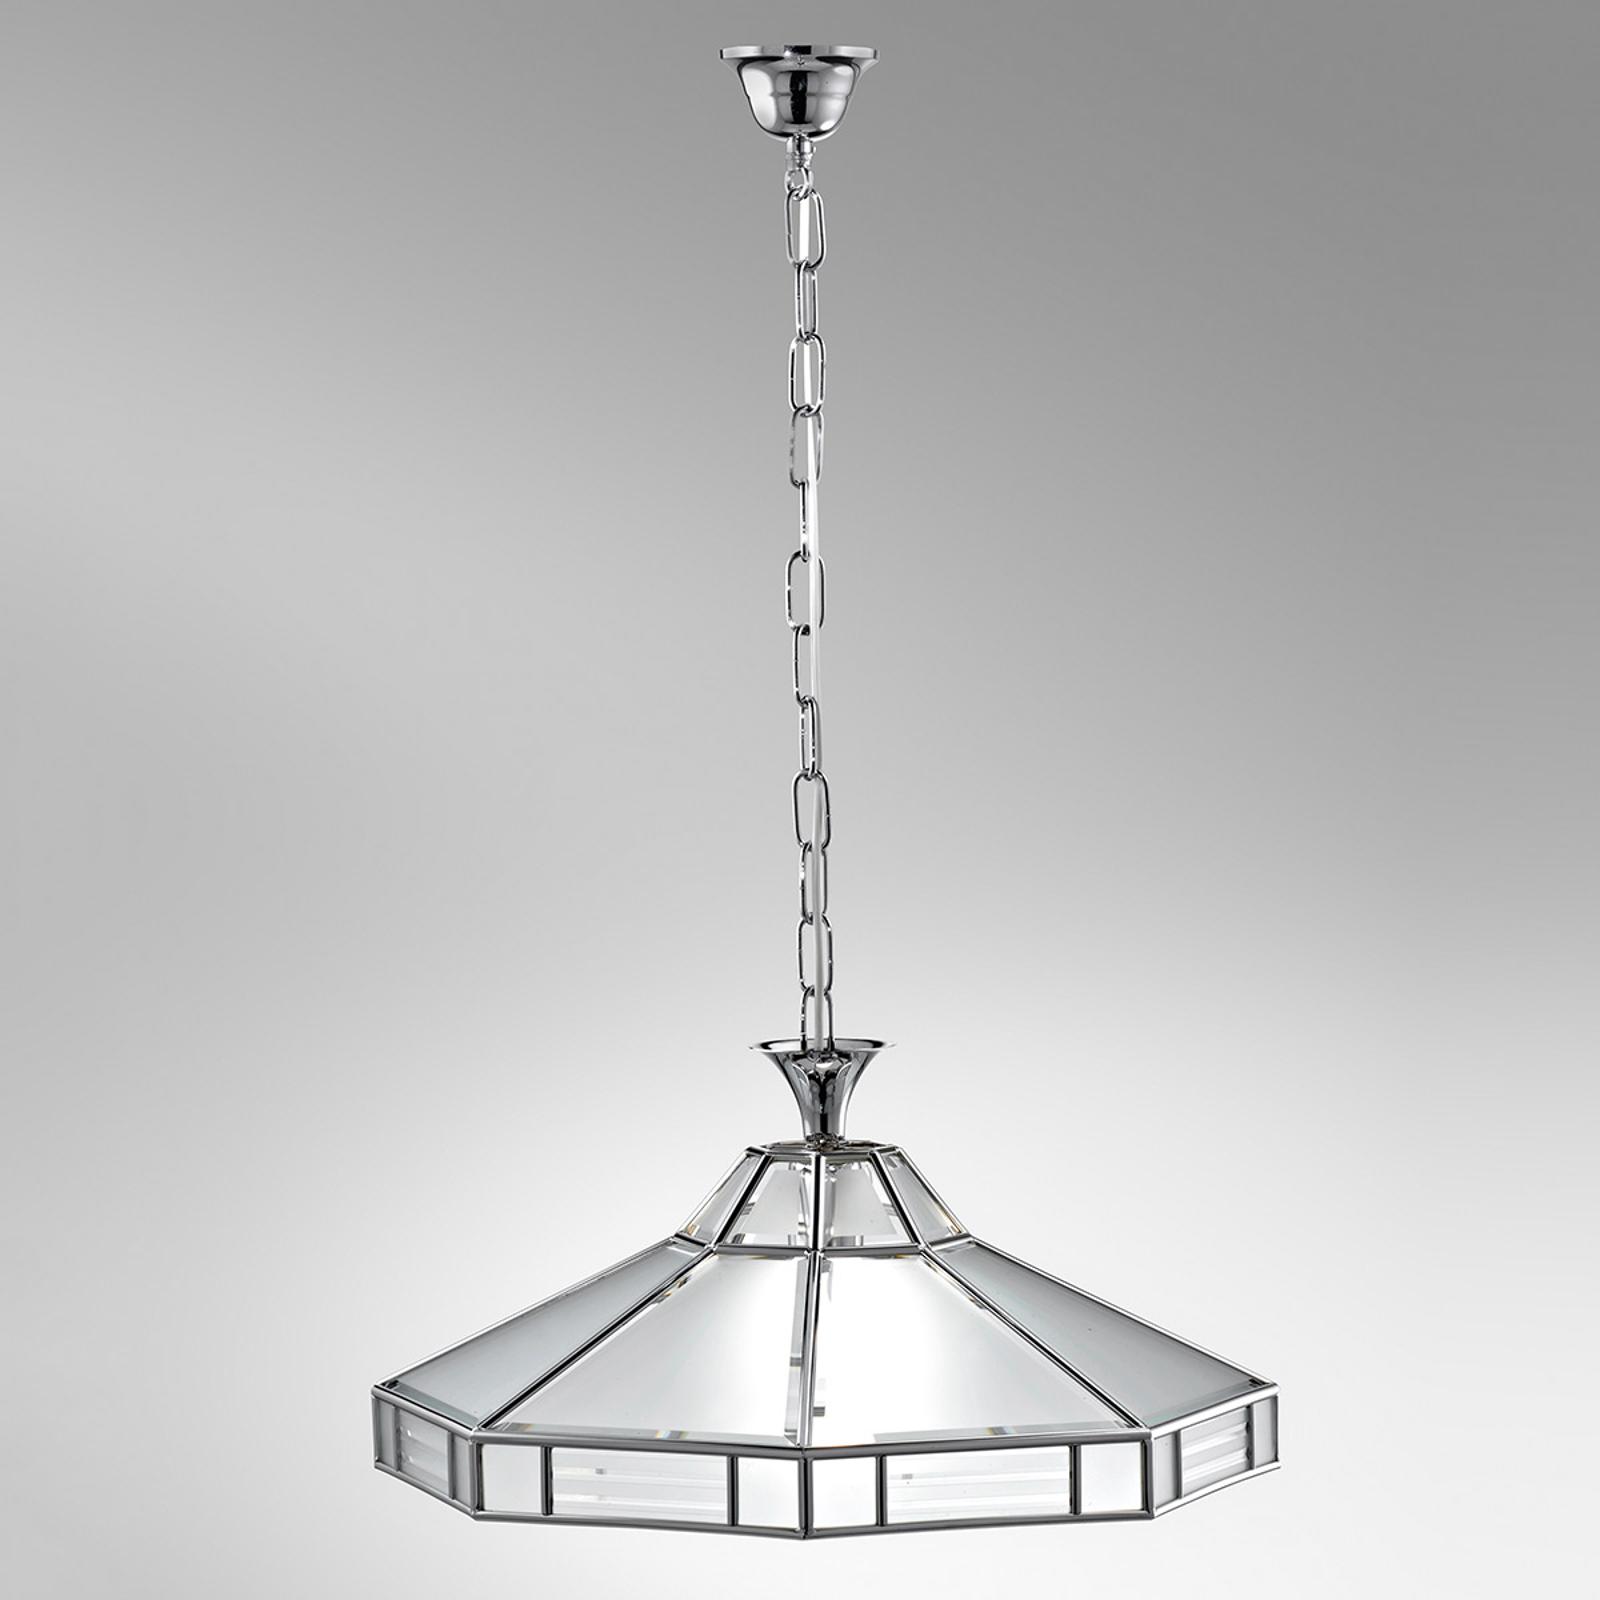 Ottekantet hængelampe Giana, krom